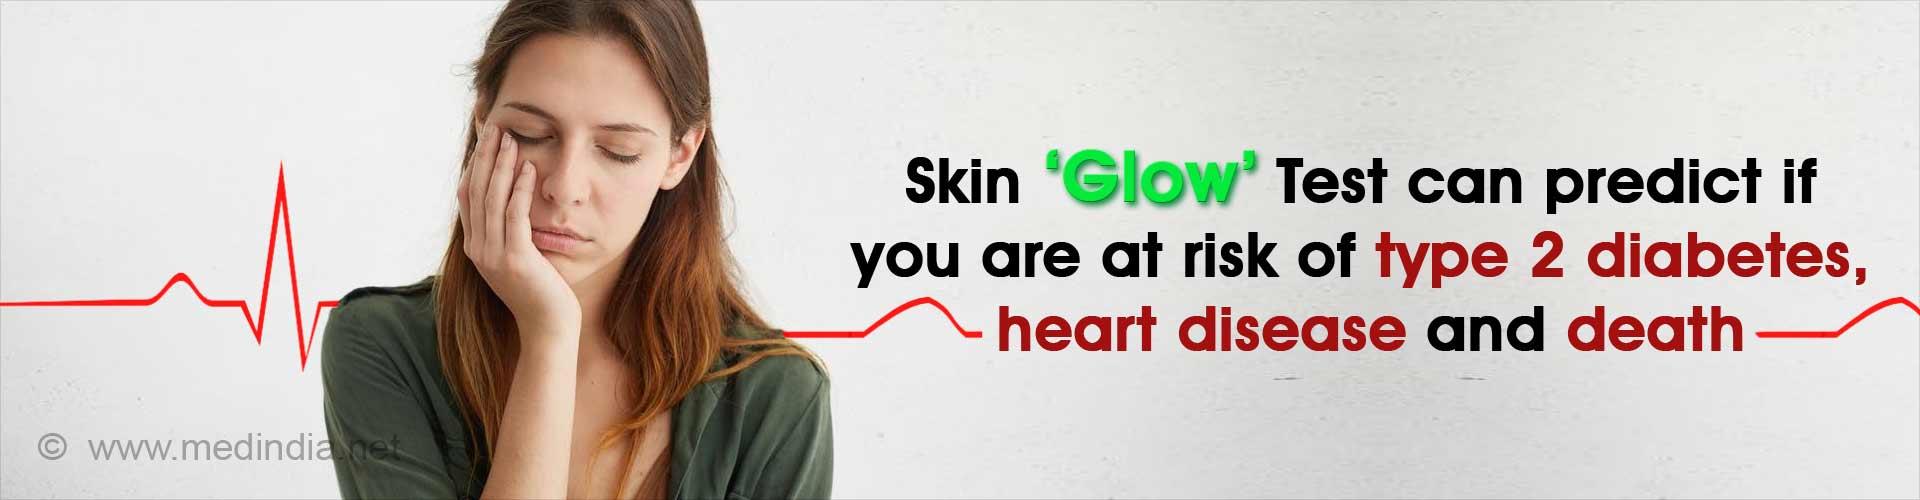 Skin Autofluorescence Predicts Future Risk of Diabetes and Heart Disease